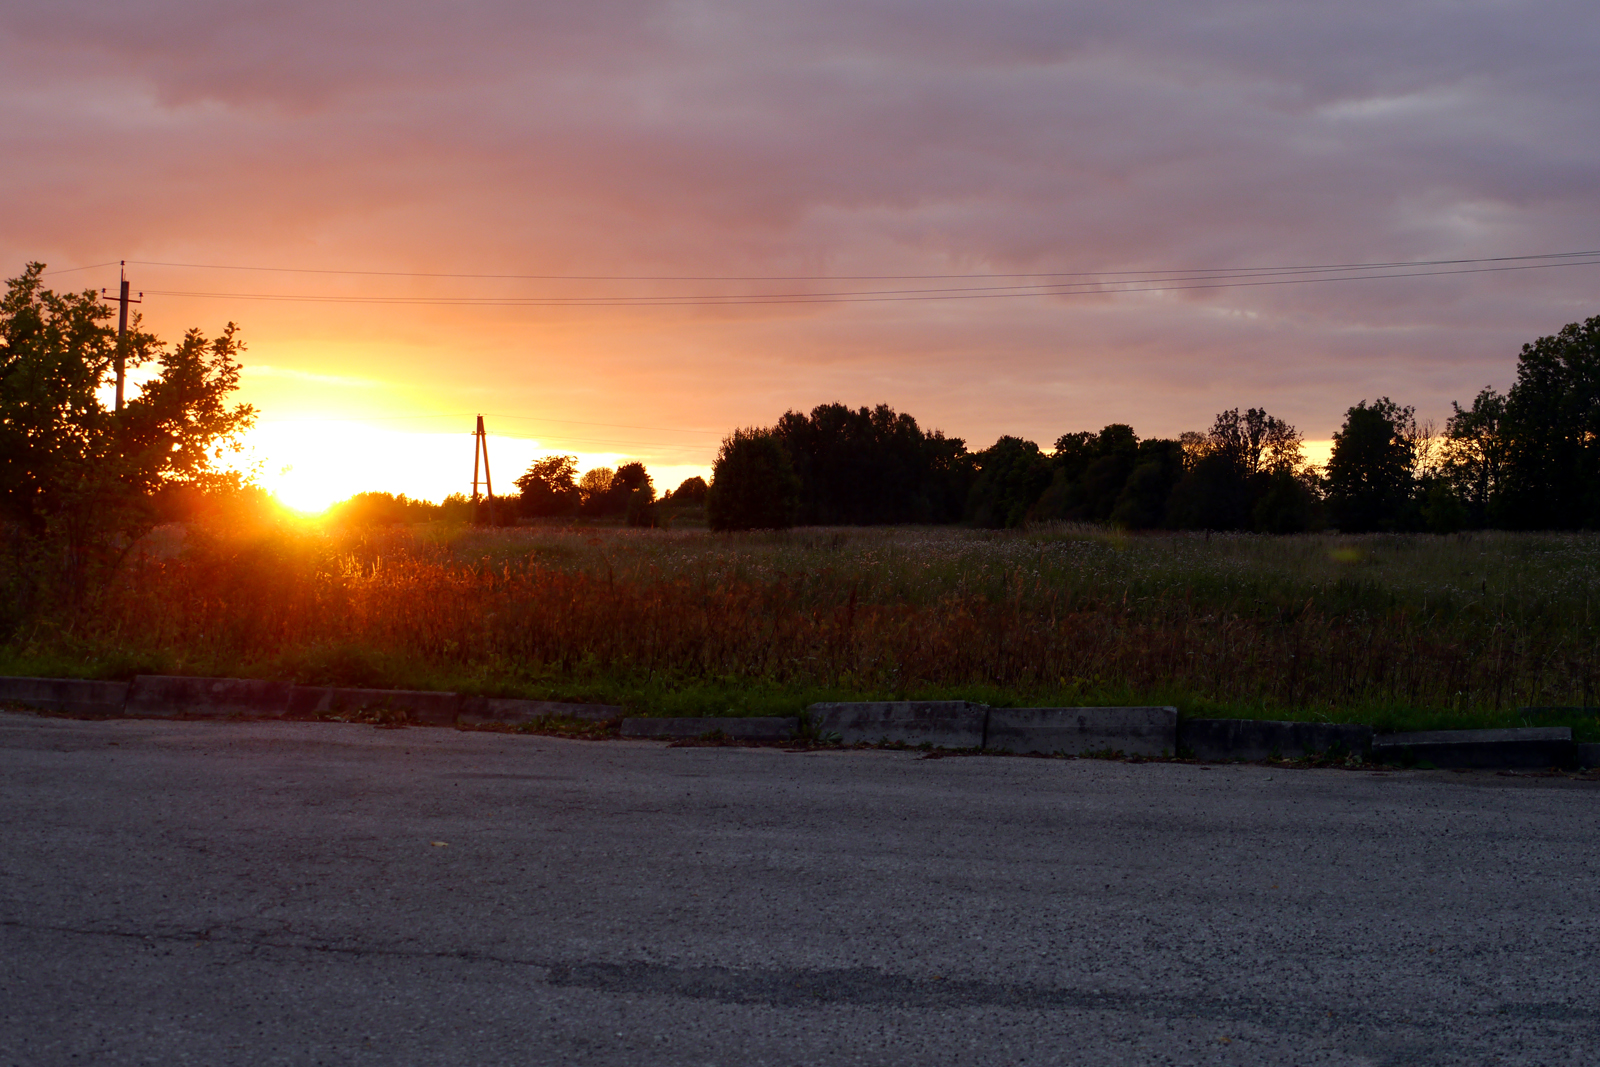 Sonnenuntergang in Palmse, Estland